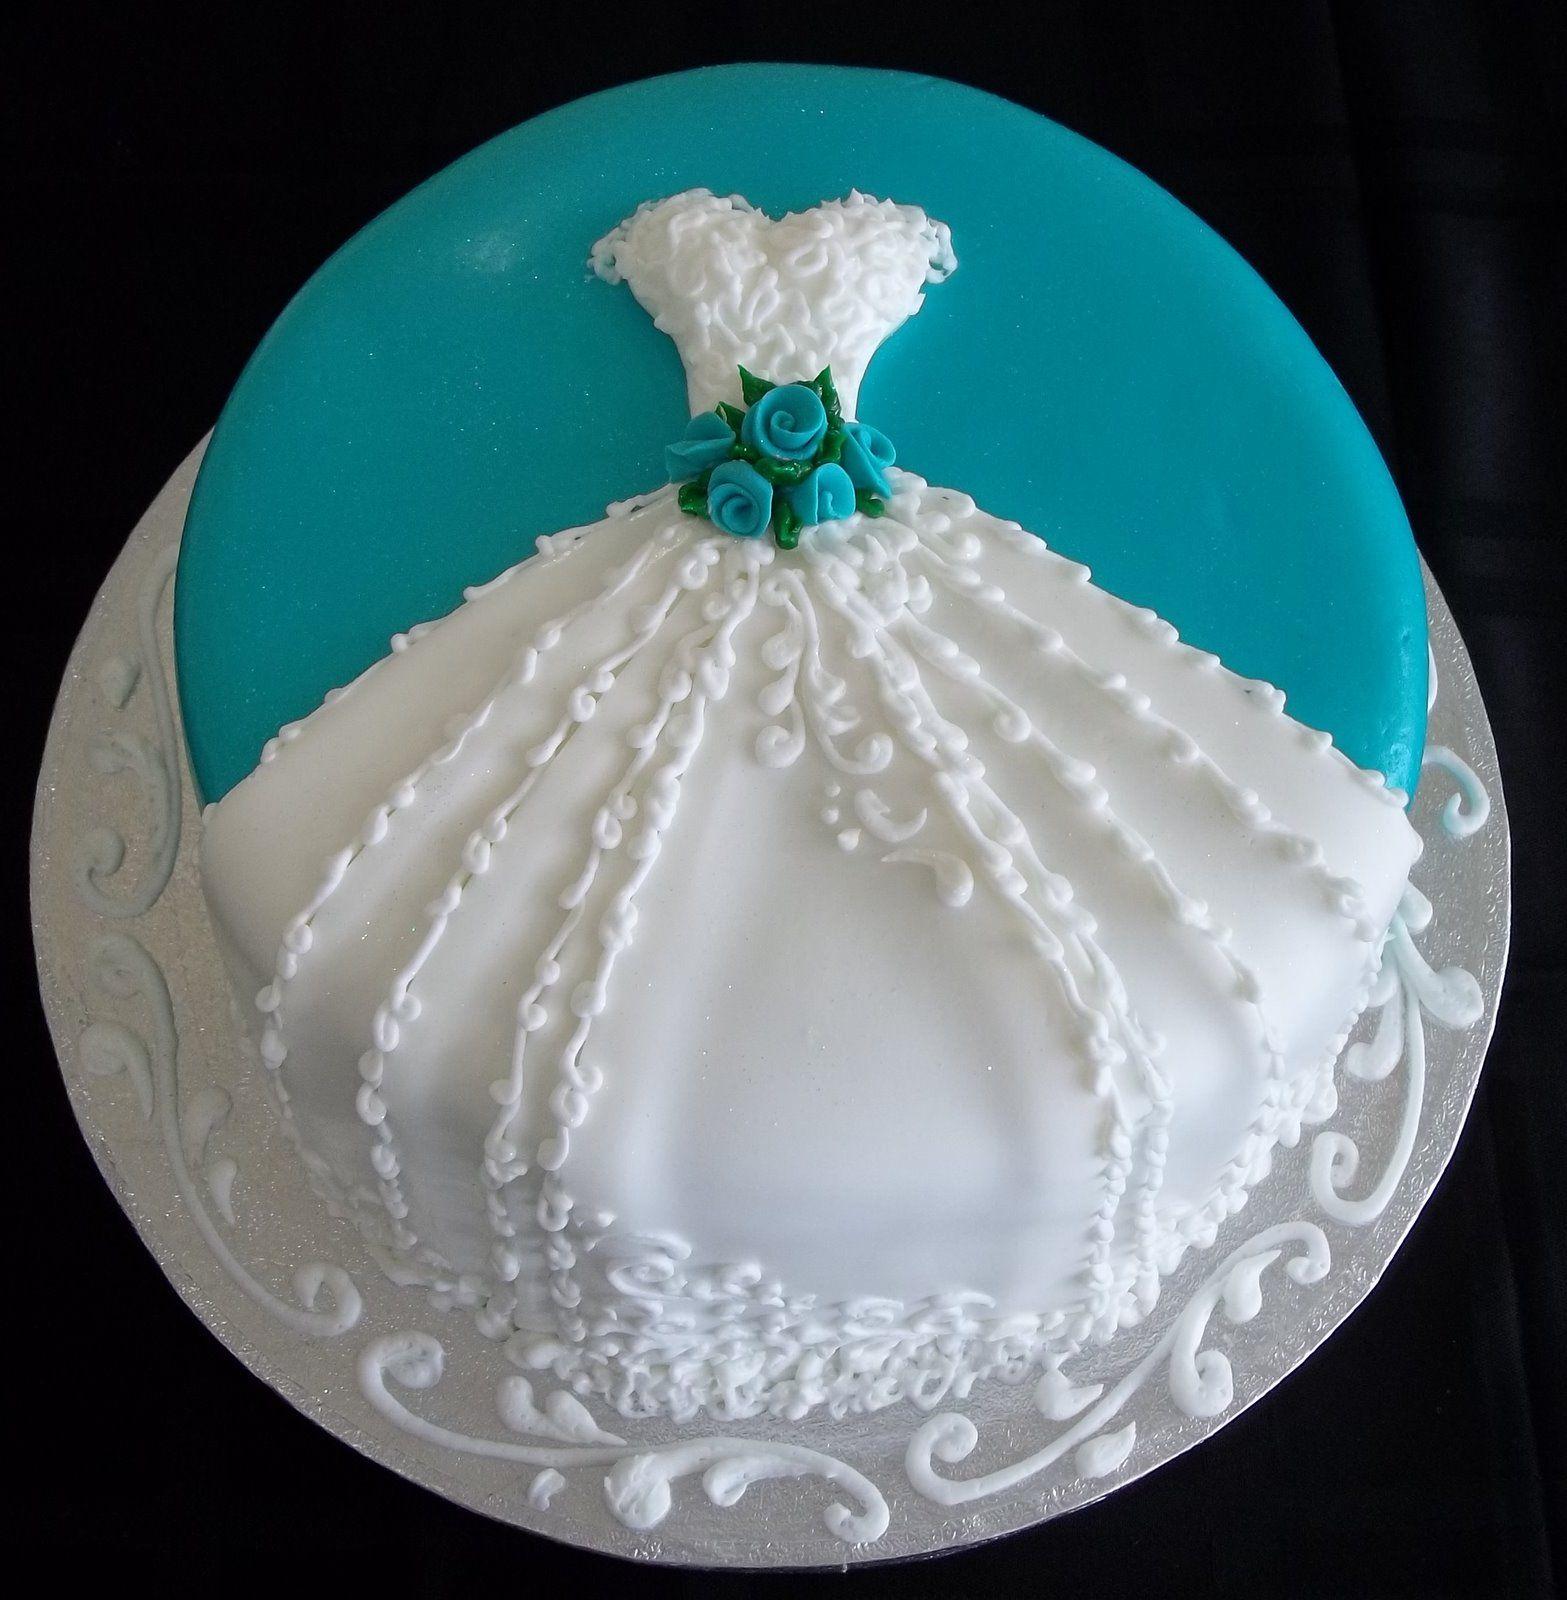 the 25 best shower cakes ideas on pinterest bridal shower cupcakes bridal shower cakes and. Black Bedroom Furniture Sets. Home Design Ideas